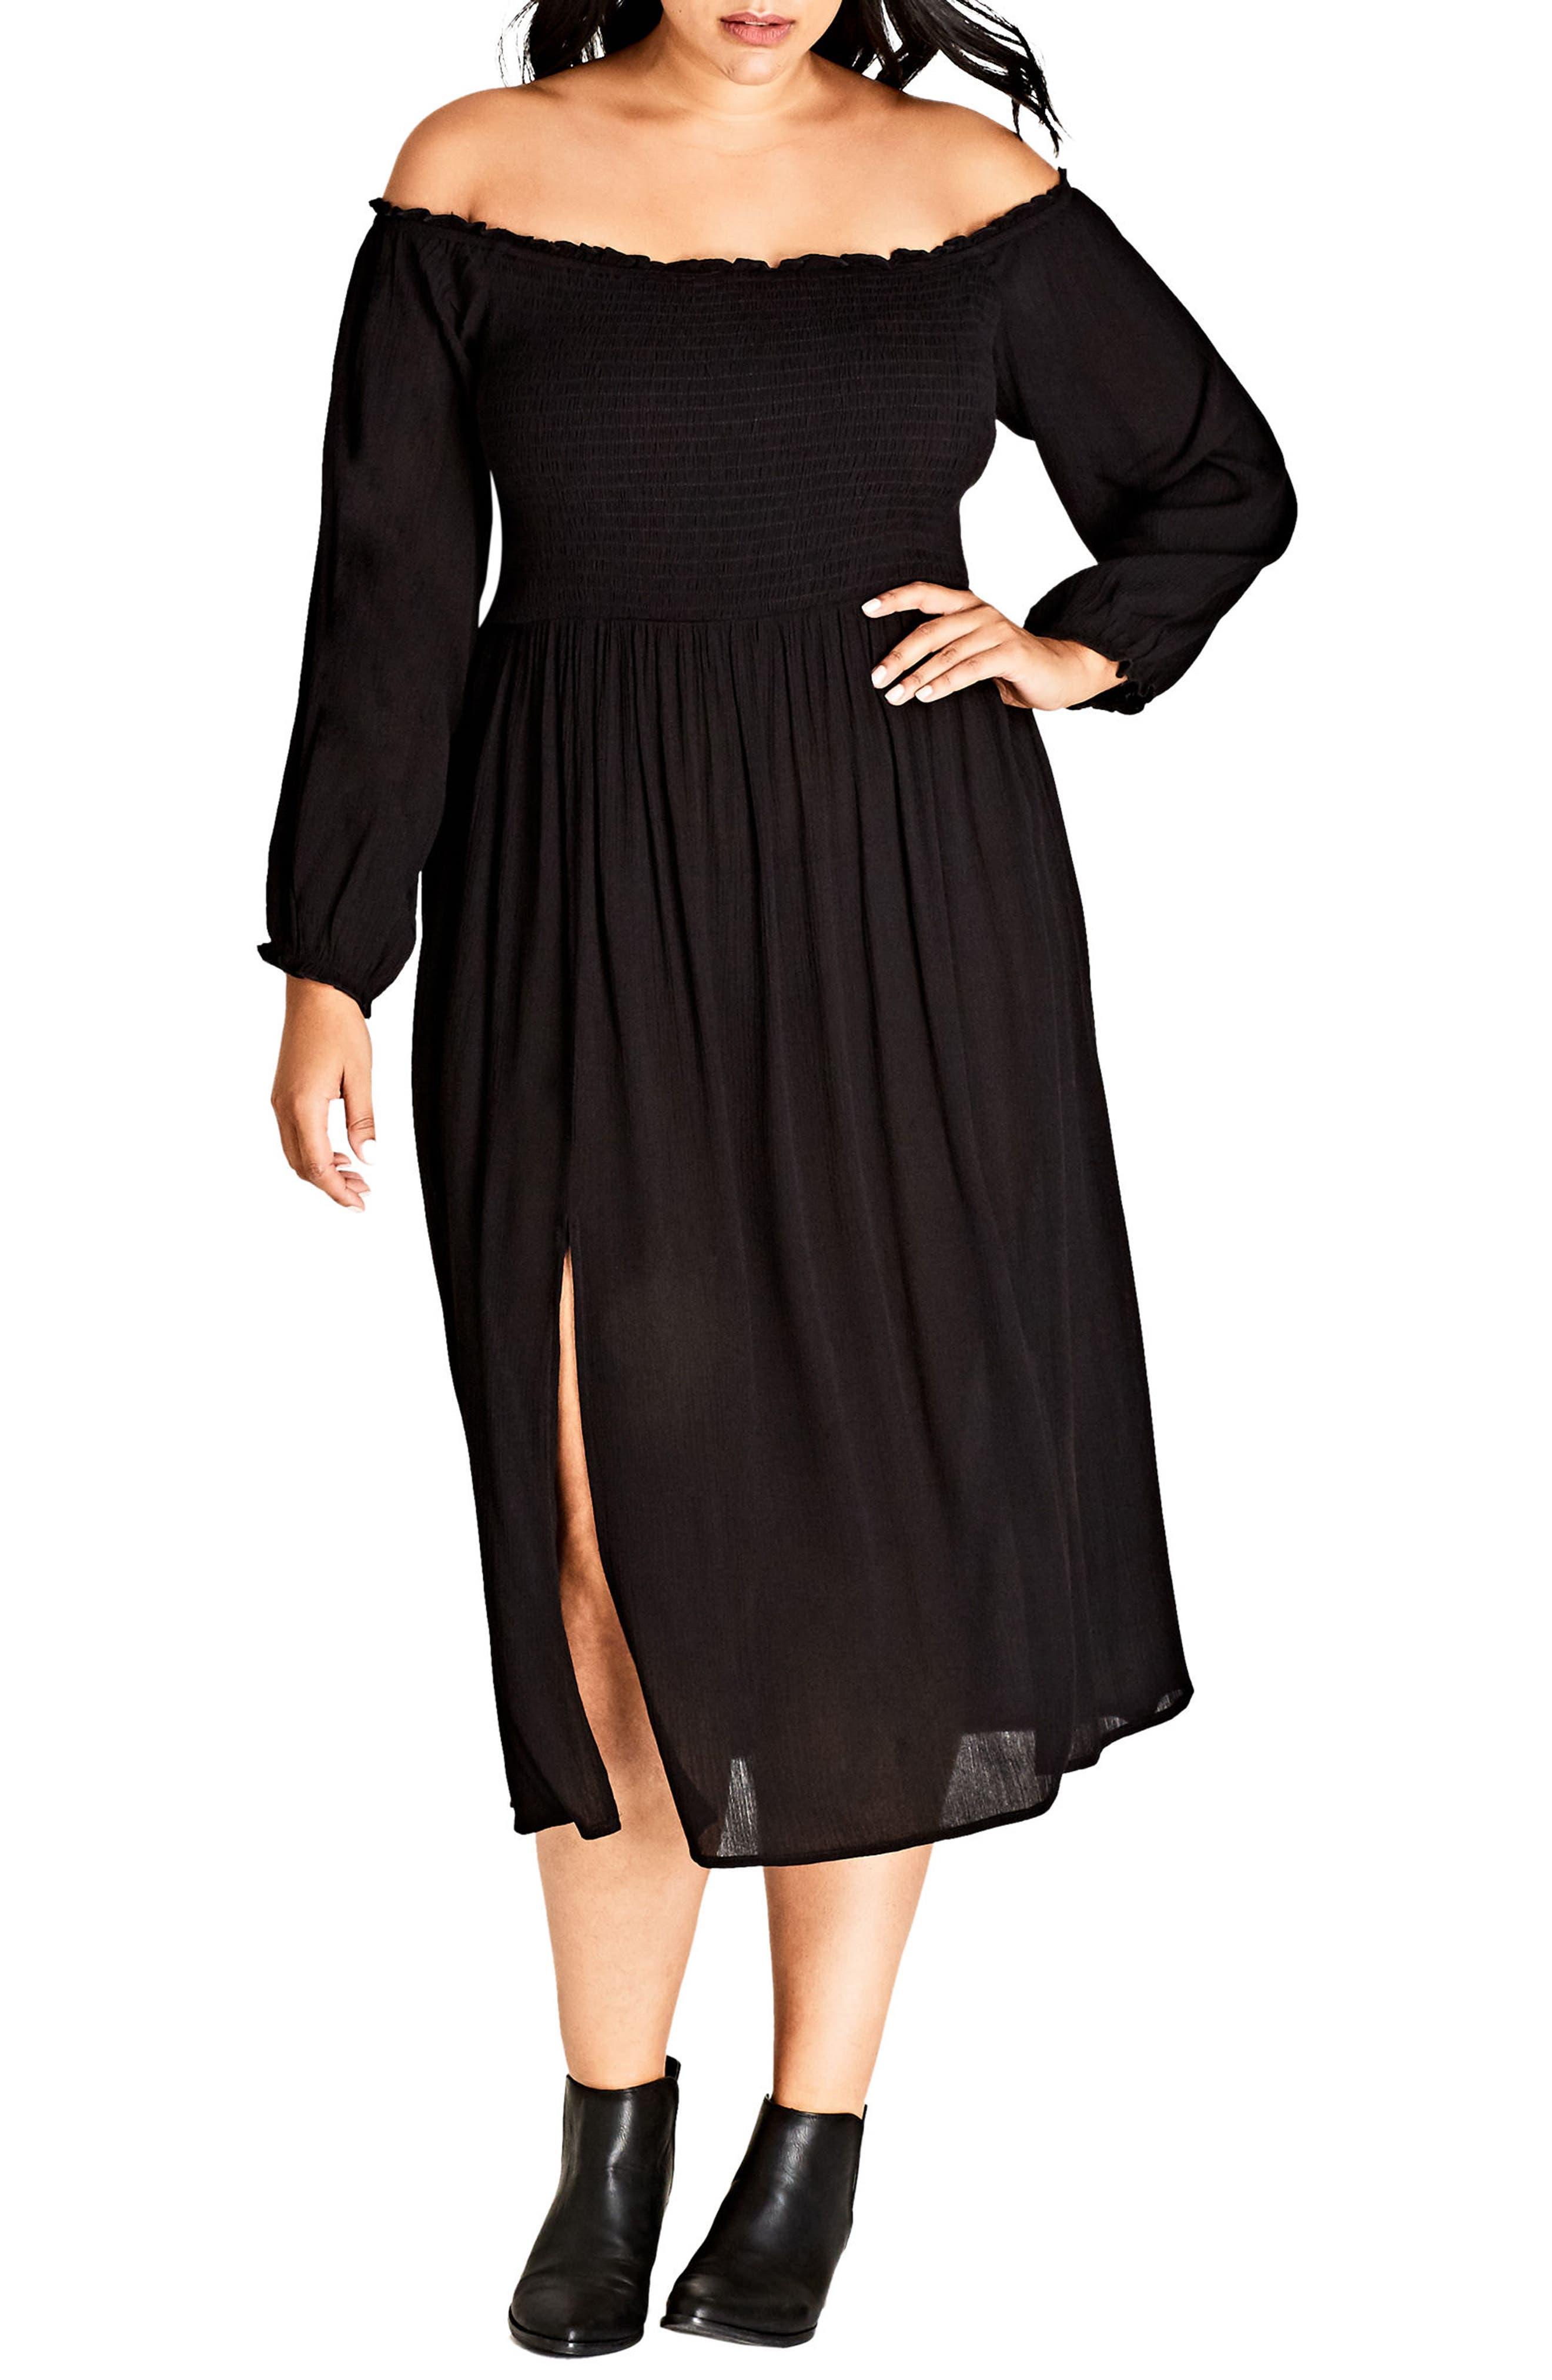 Alternate Image 1 Selected - City Chic Vintage Midi Dress (Plus Size)